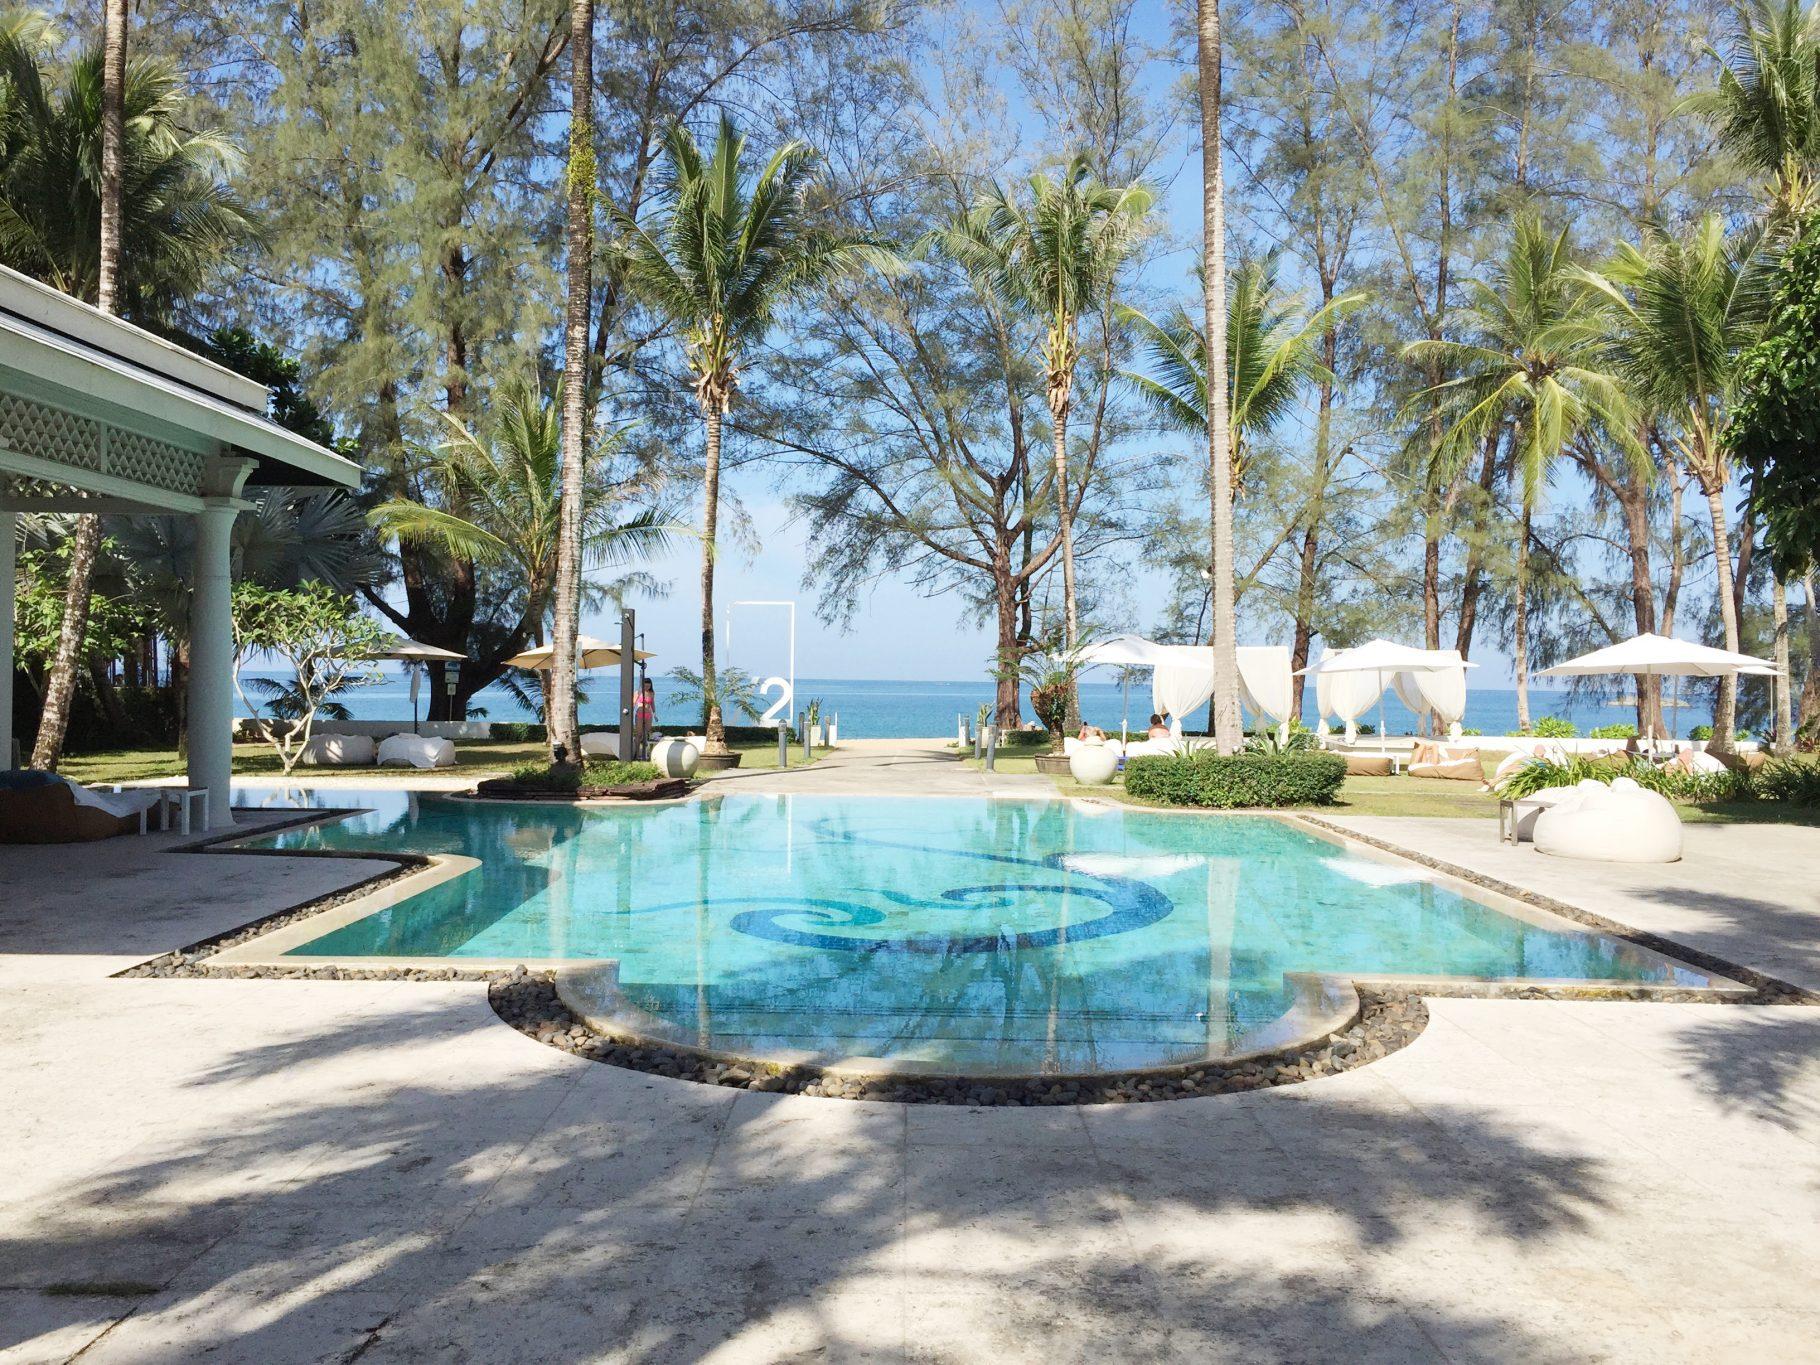 Hotel Review: X2 Khao Lak Anda Mani Resort